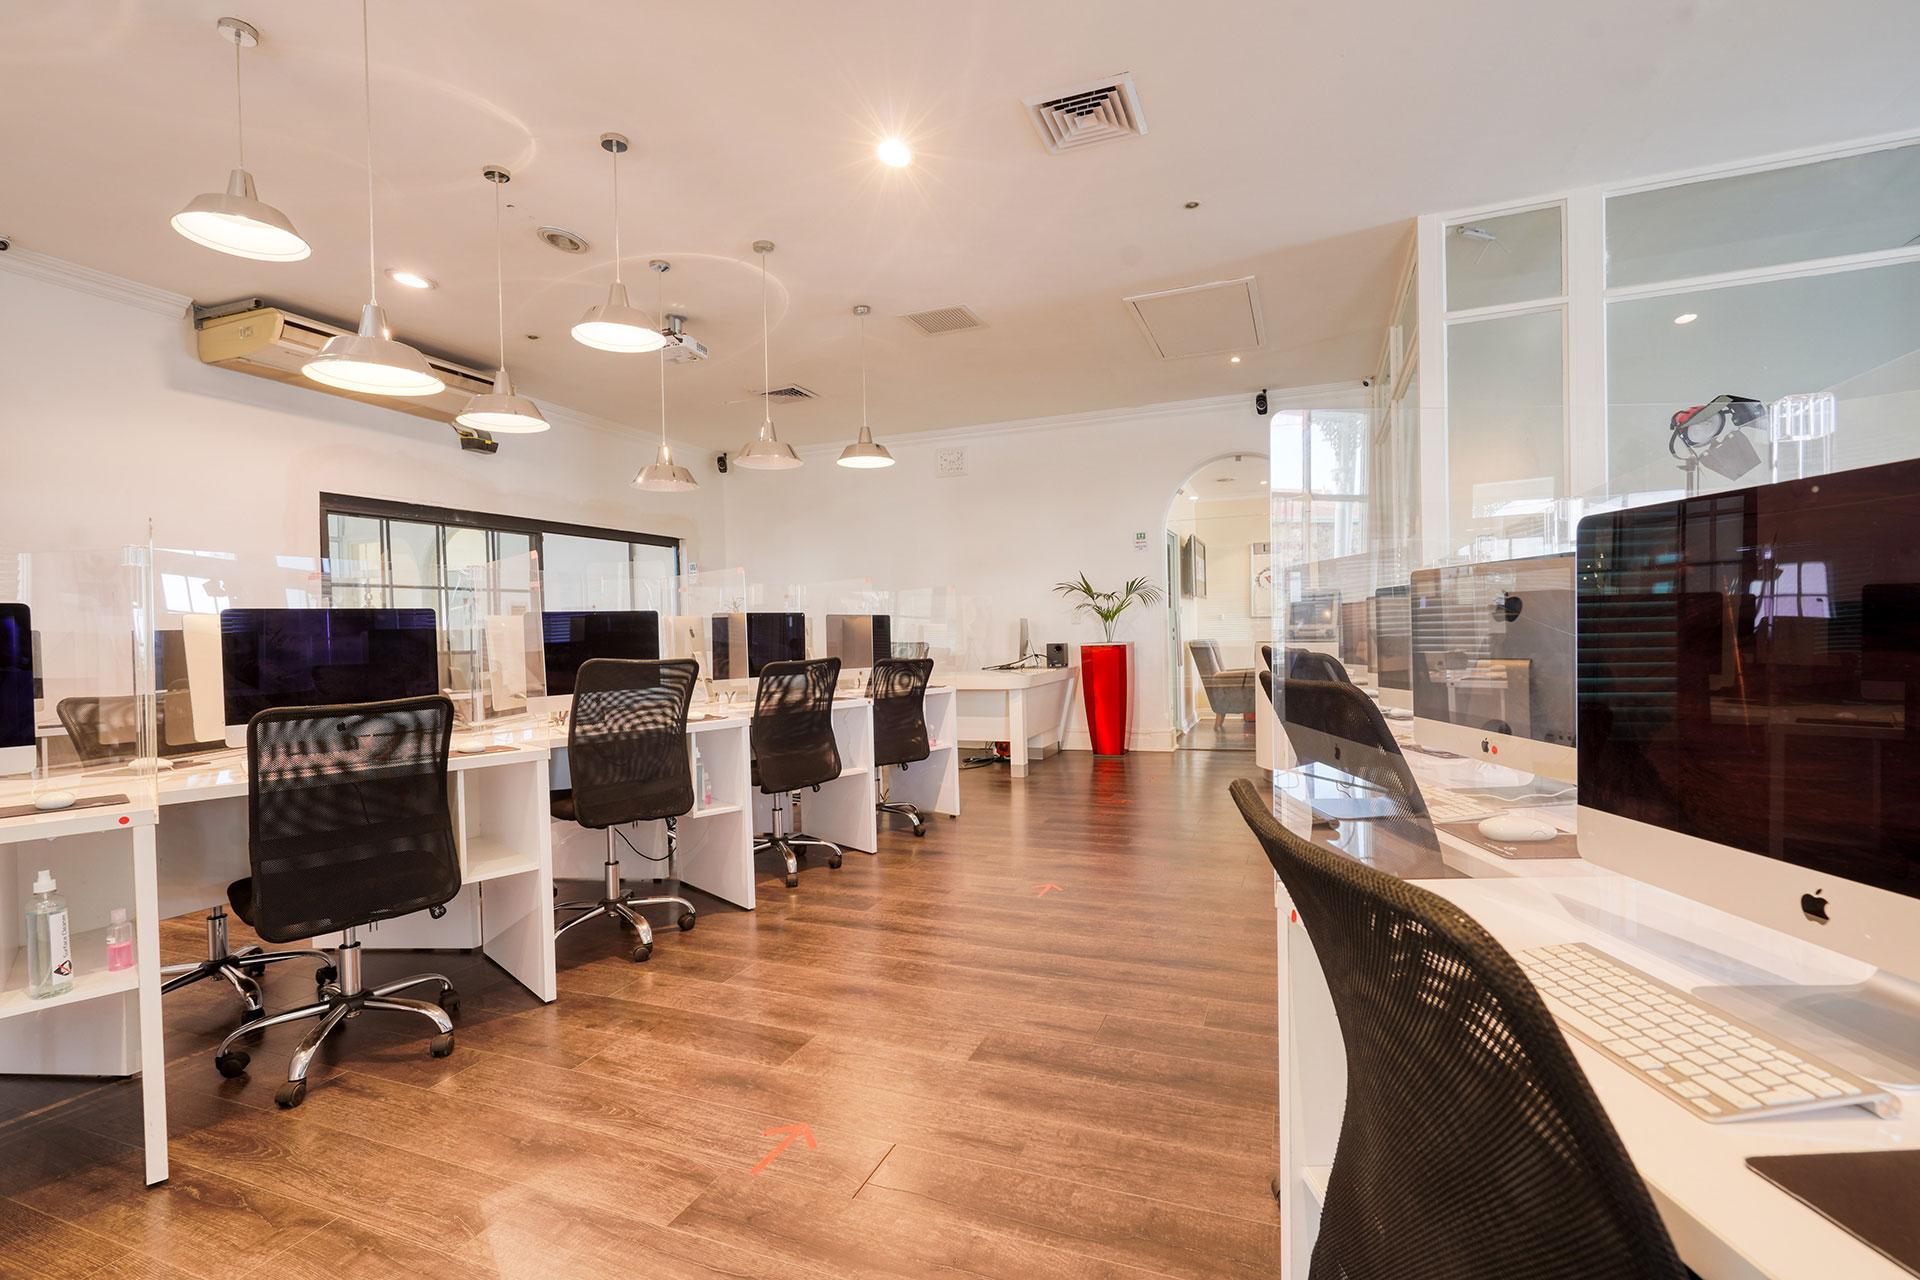 keyline training facility, graphic design courses